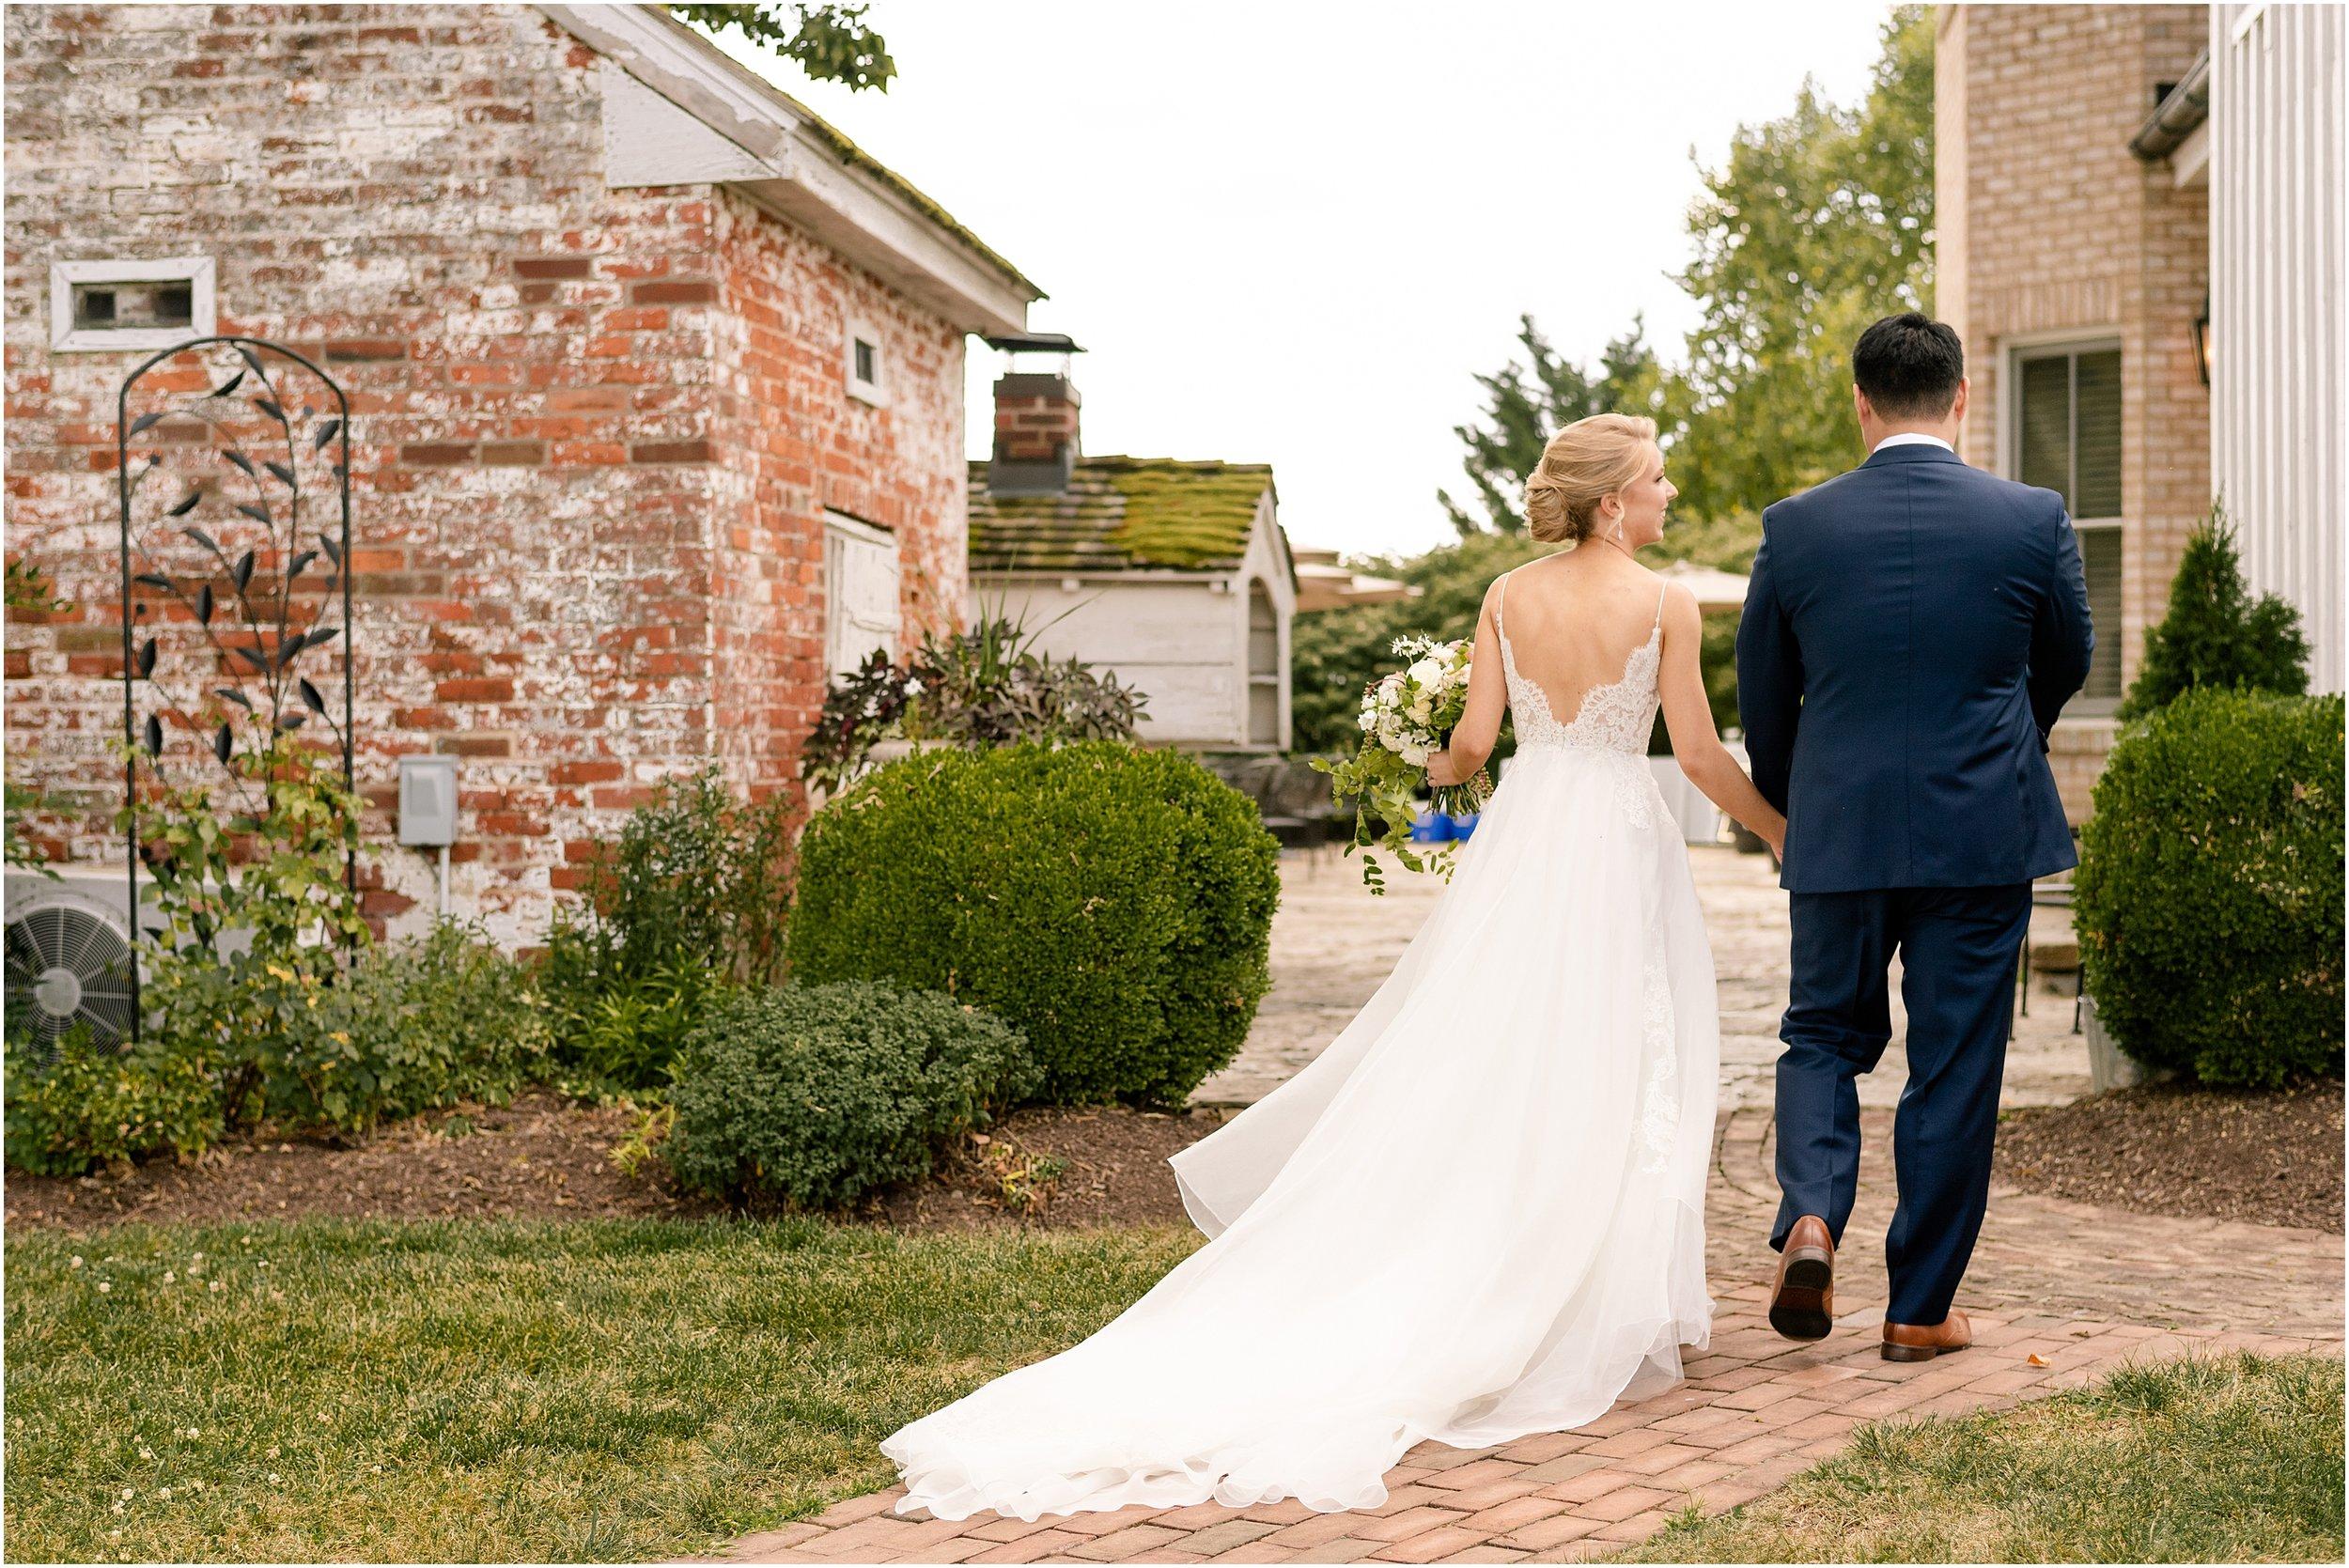 hannah leigh photography Walkers Overlook Wedding Walkersville MD_3502.jpg